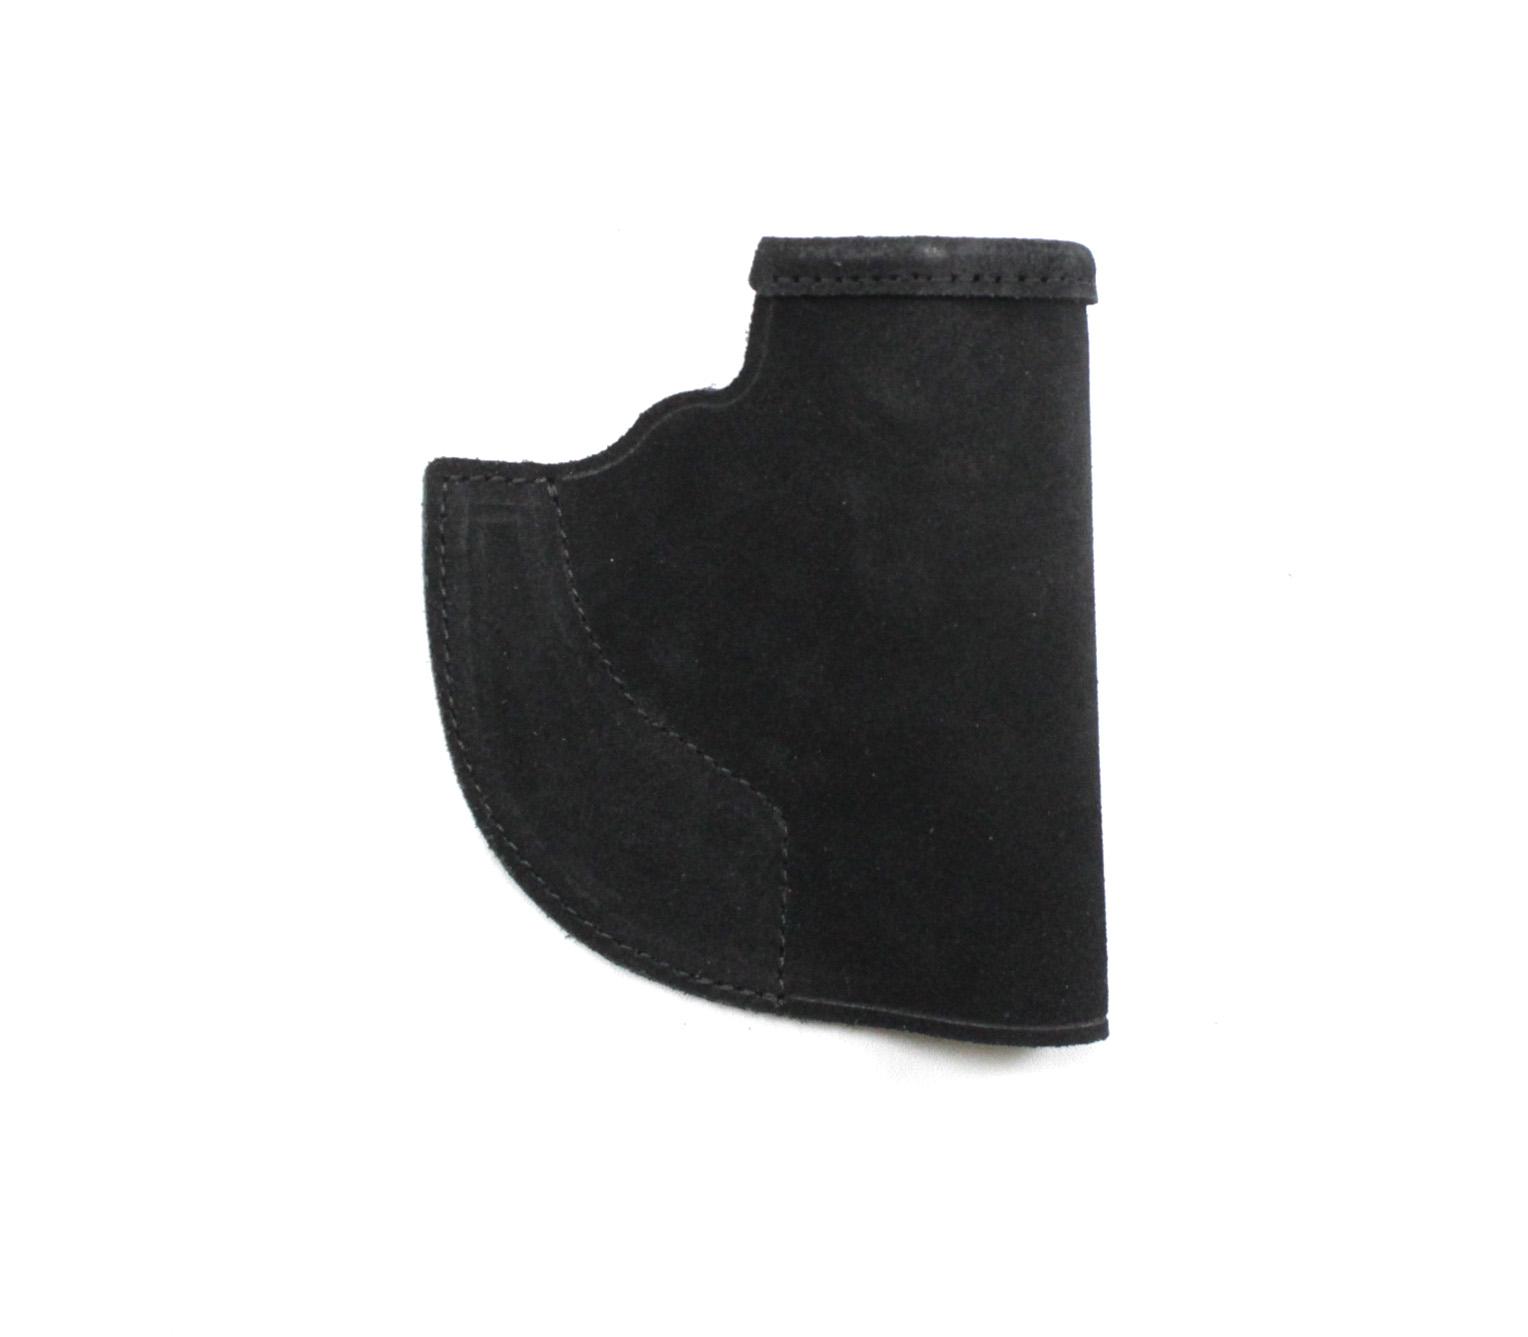 Galco Pocket Protector Holster Smith Wesson J-Frame, Kimber K6 ...